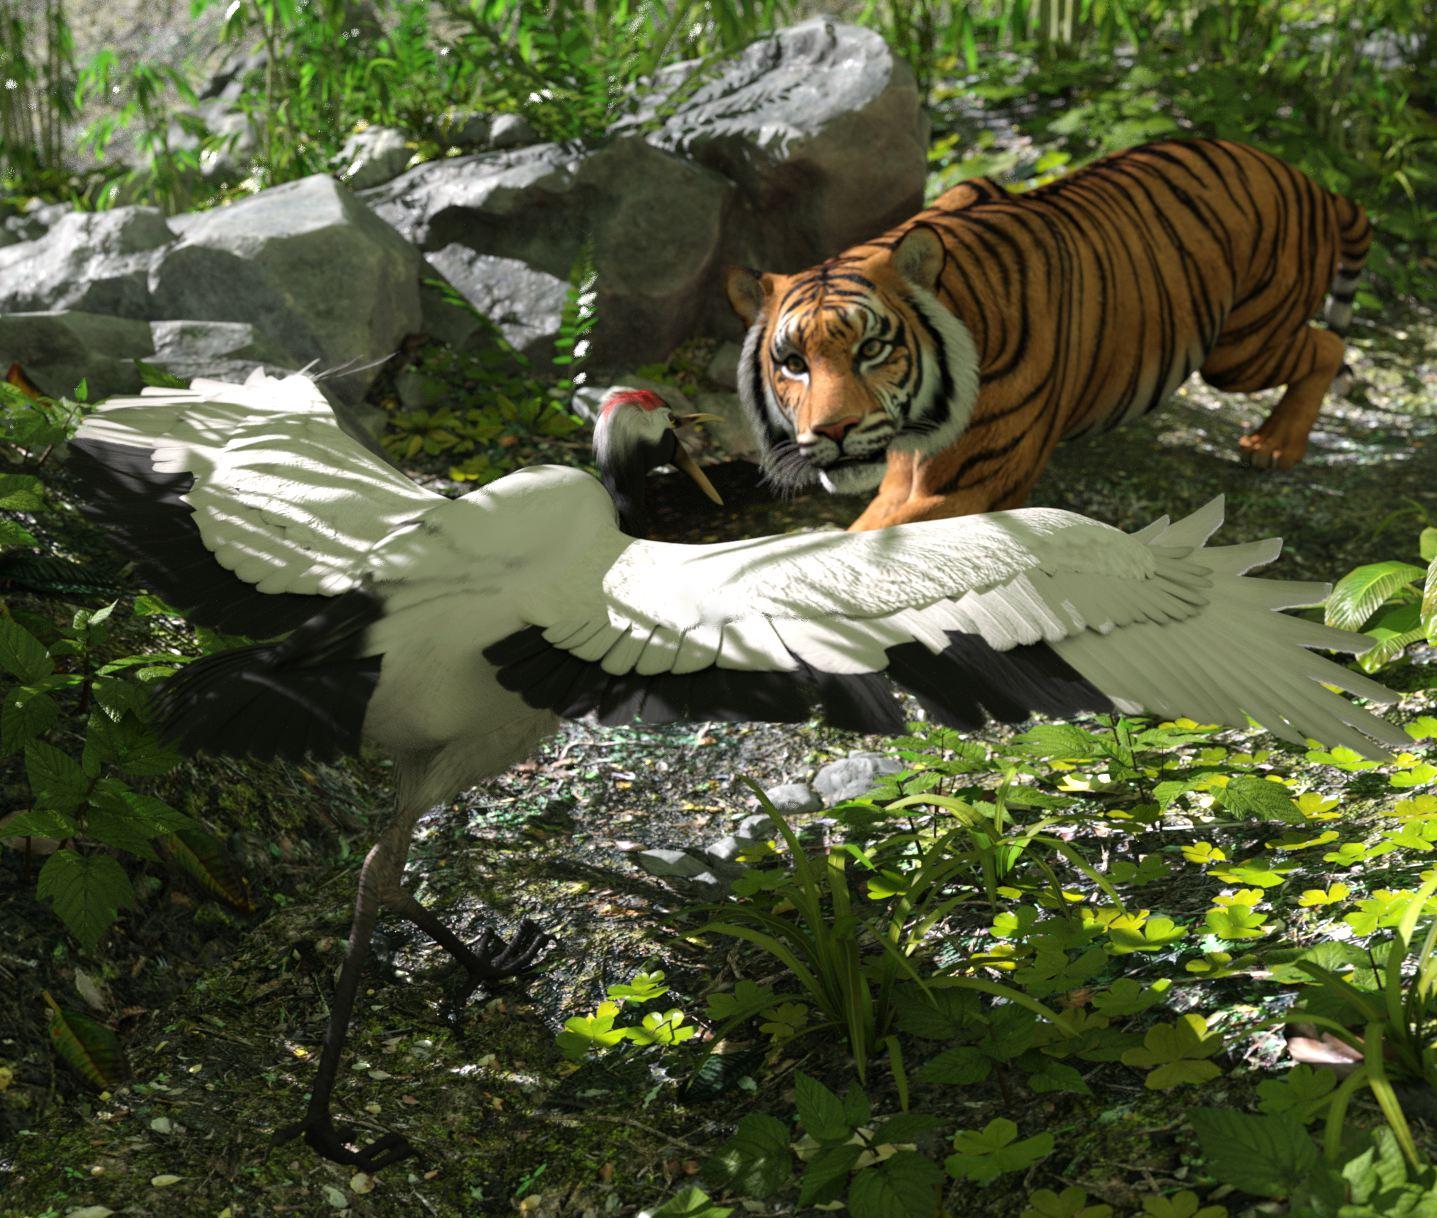 the tiger crane.jpg